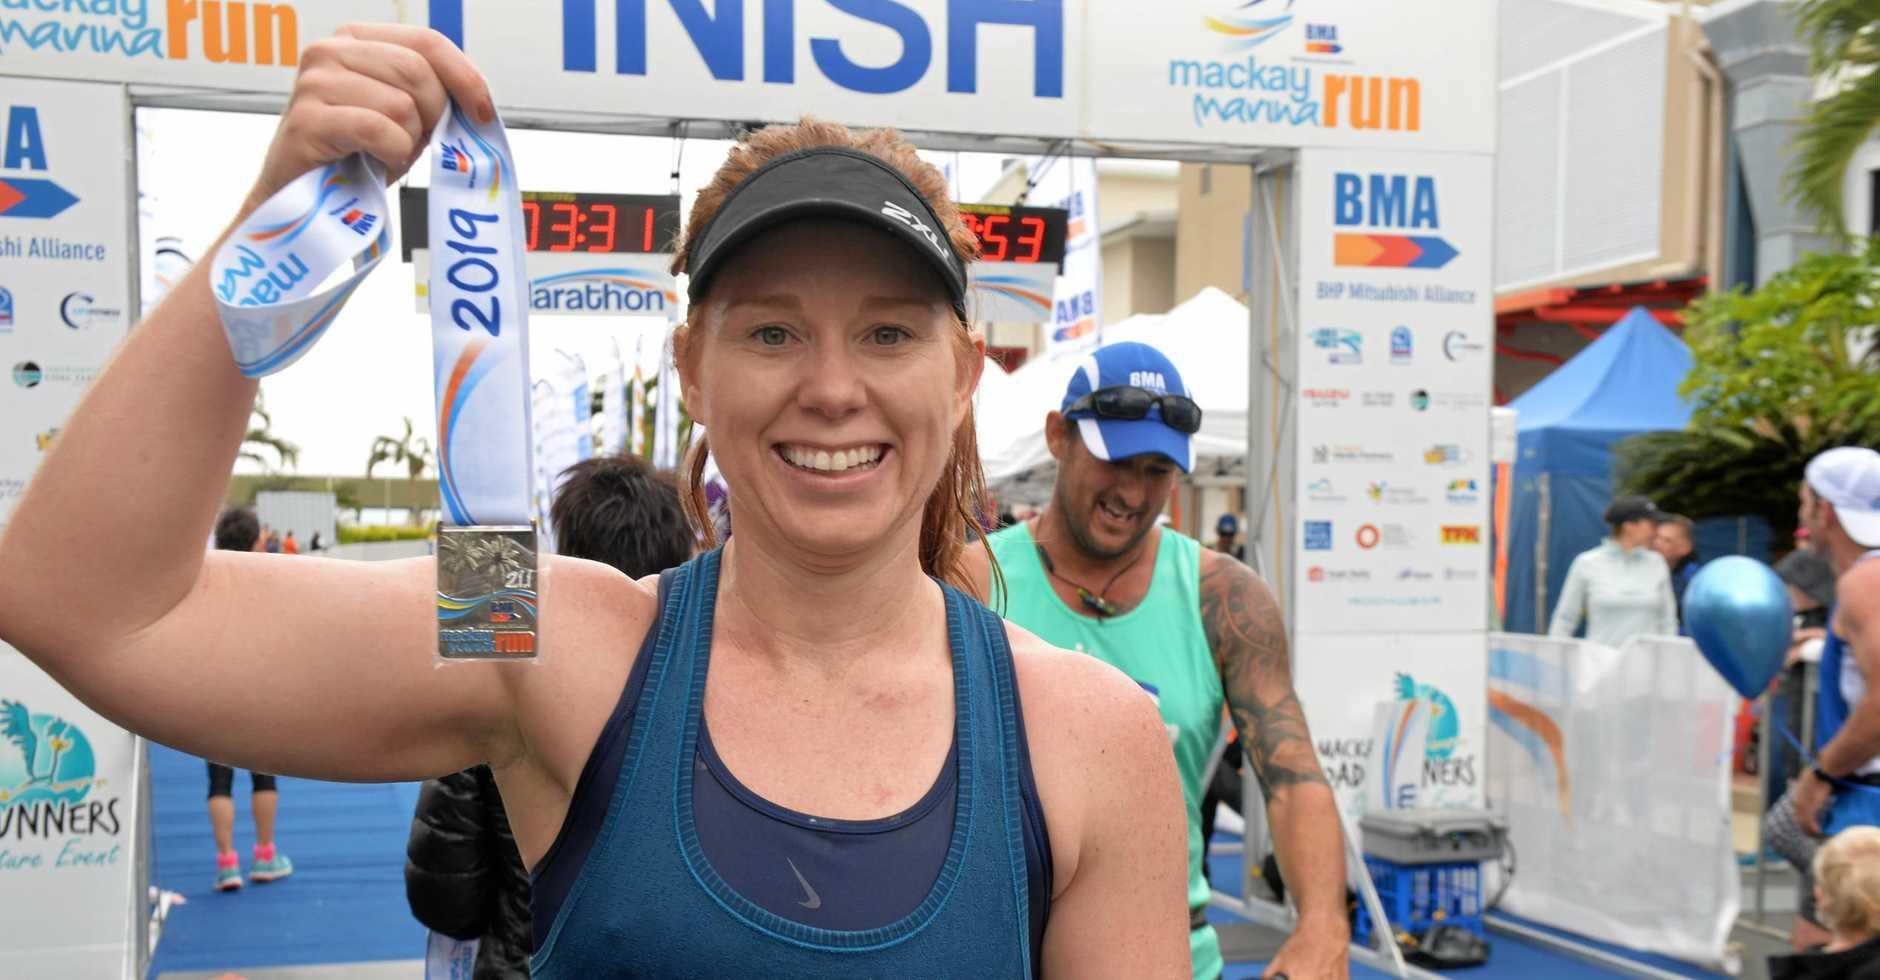 ACHIEVEMENT: Lauren Hay proudly presents her half-marathon medal at the Mackay Marina Run.